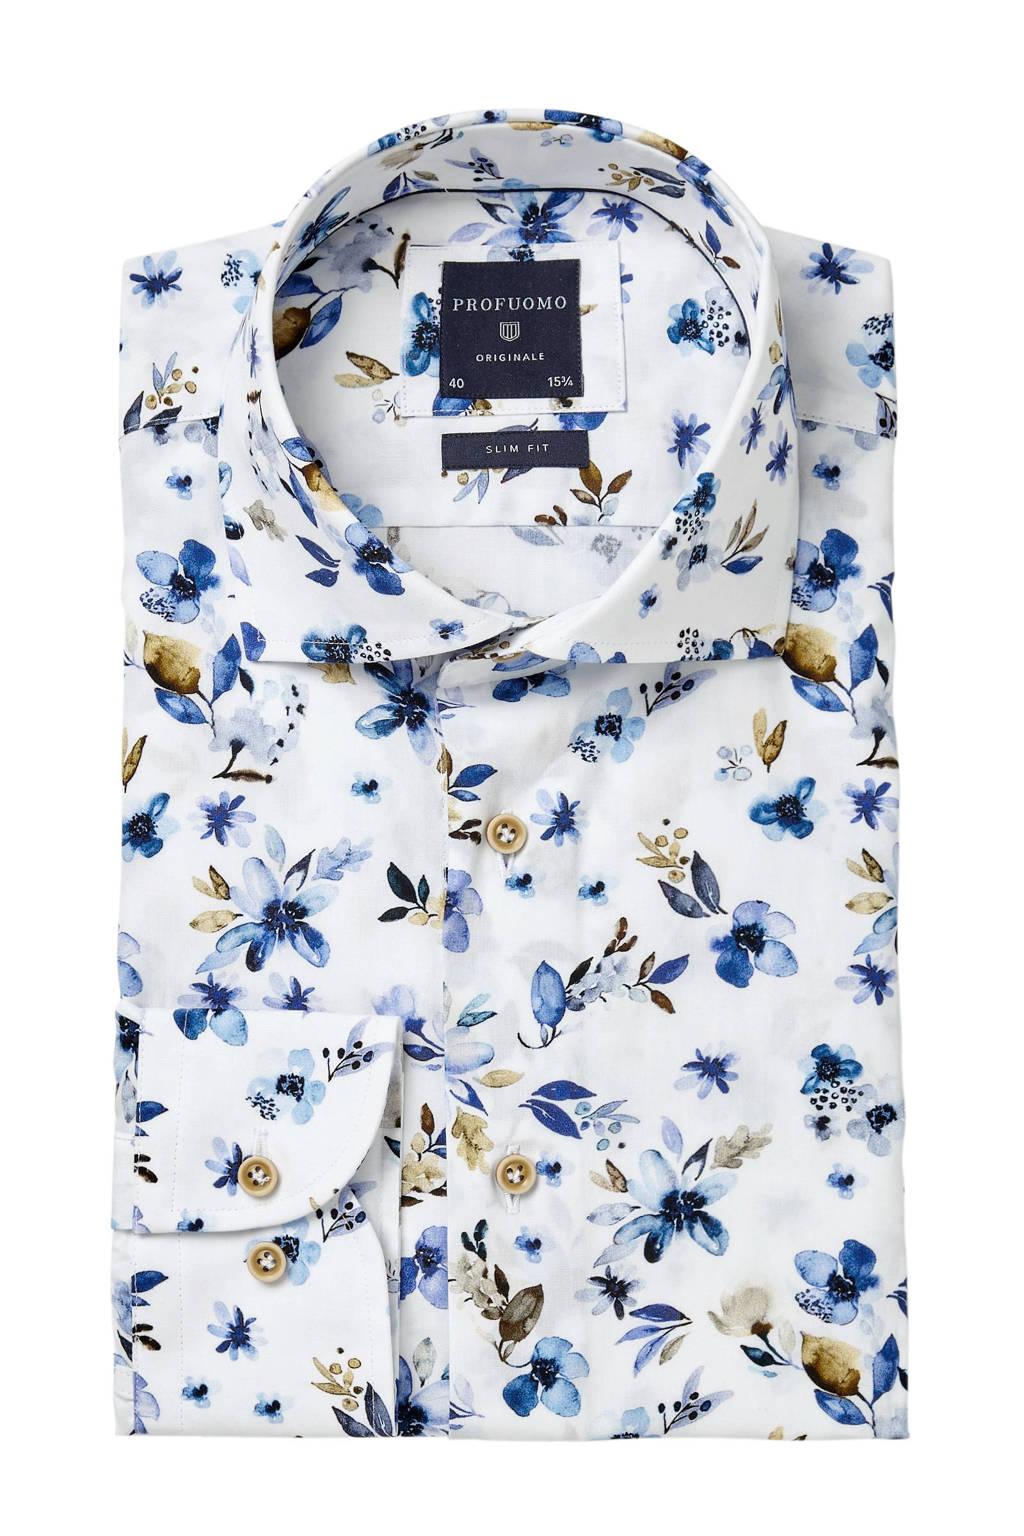 Profuomo slim fit overhemd met print, Wit/blauw